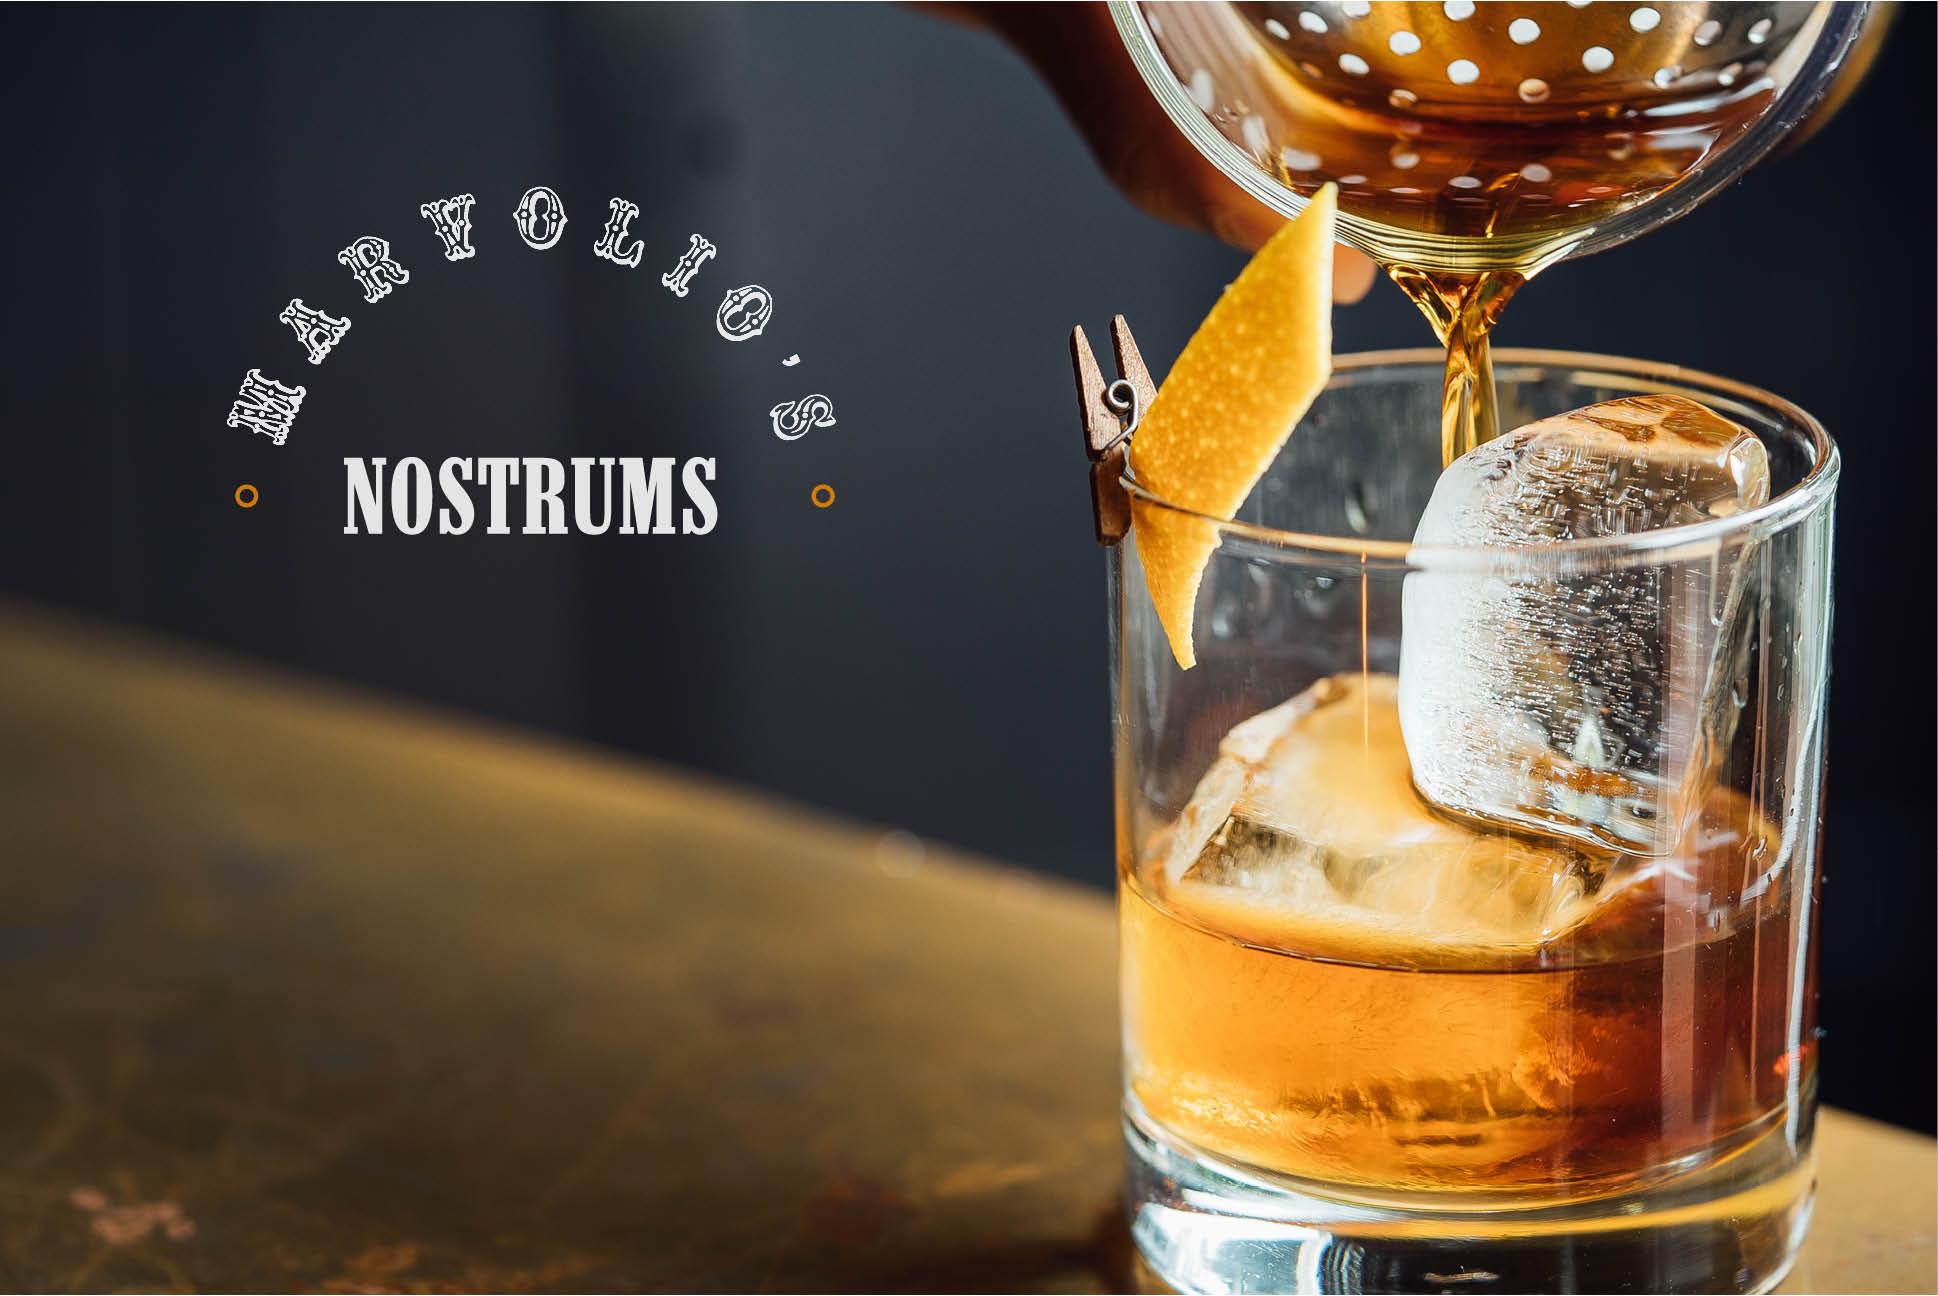 Marvolio's Nostrums branding   Marvolio's Nostrums   Independent Marketing Packaging, Design and Website Design Services   IM London